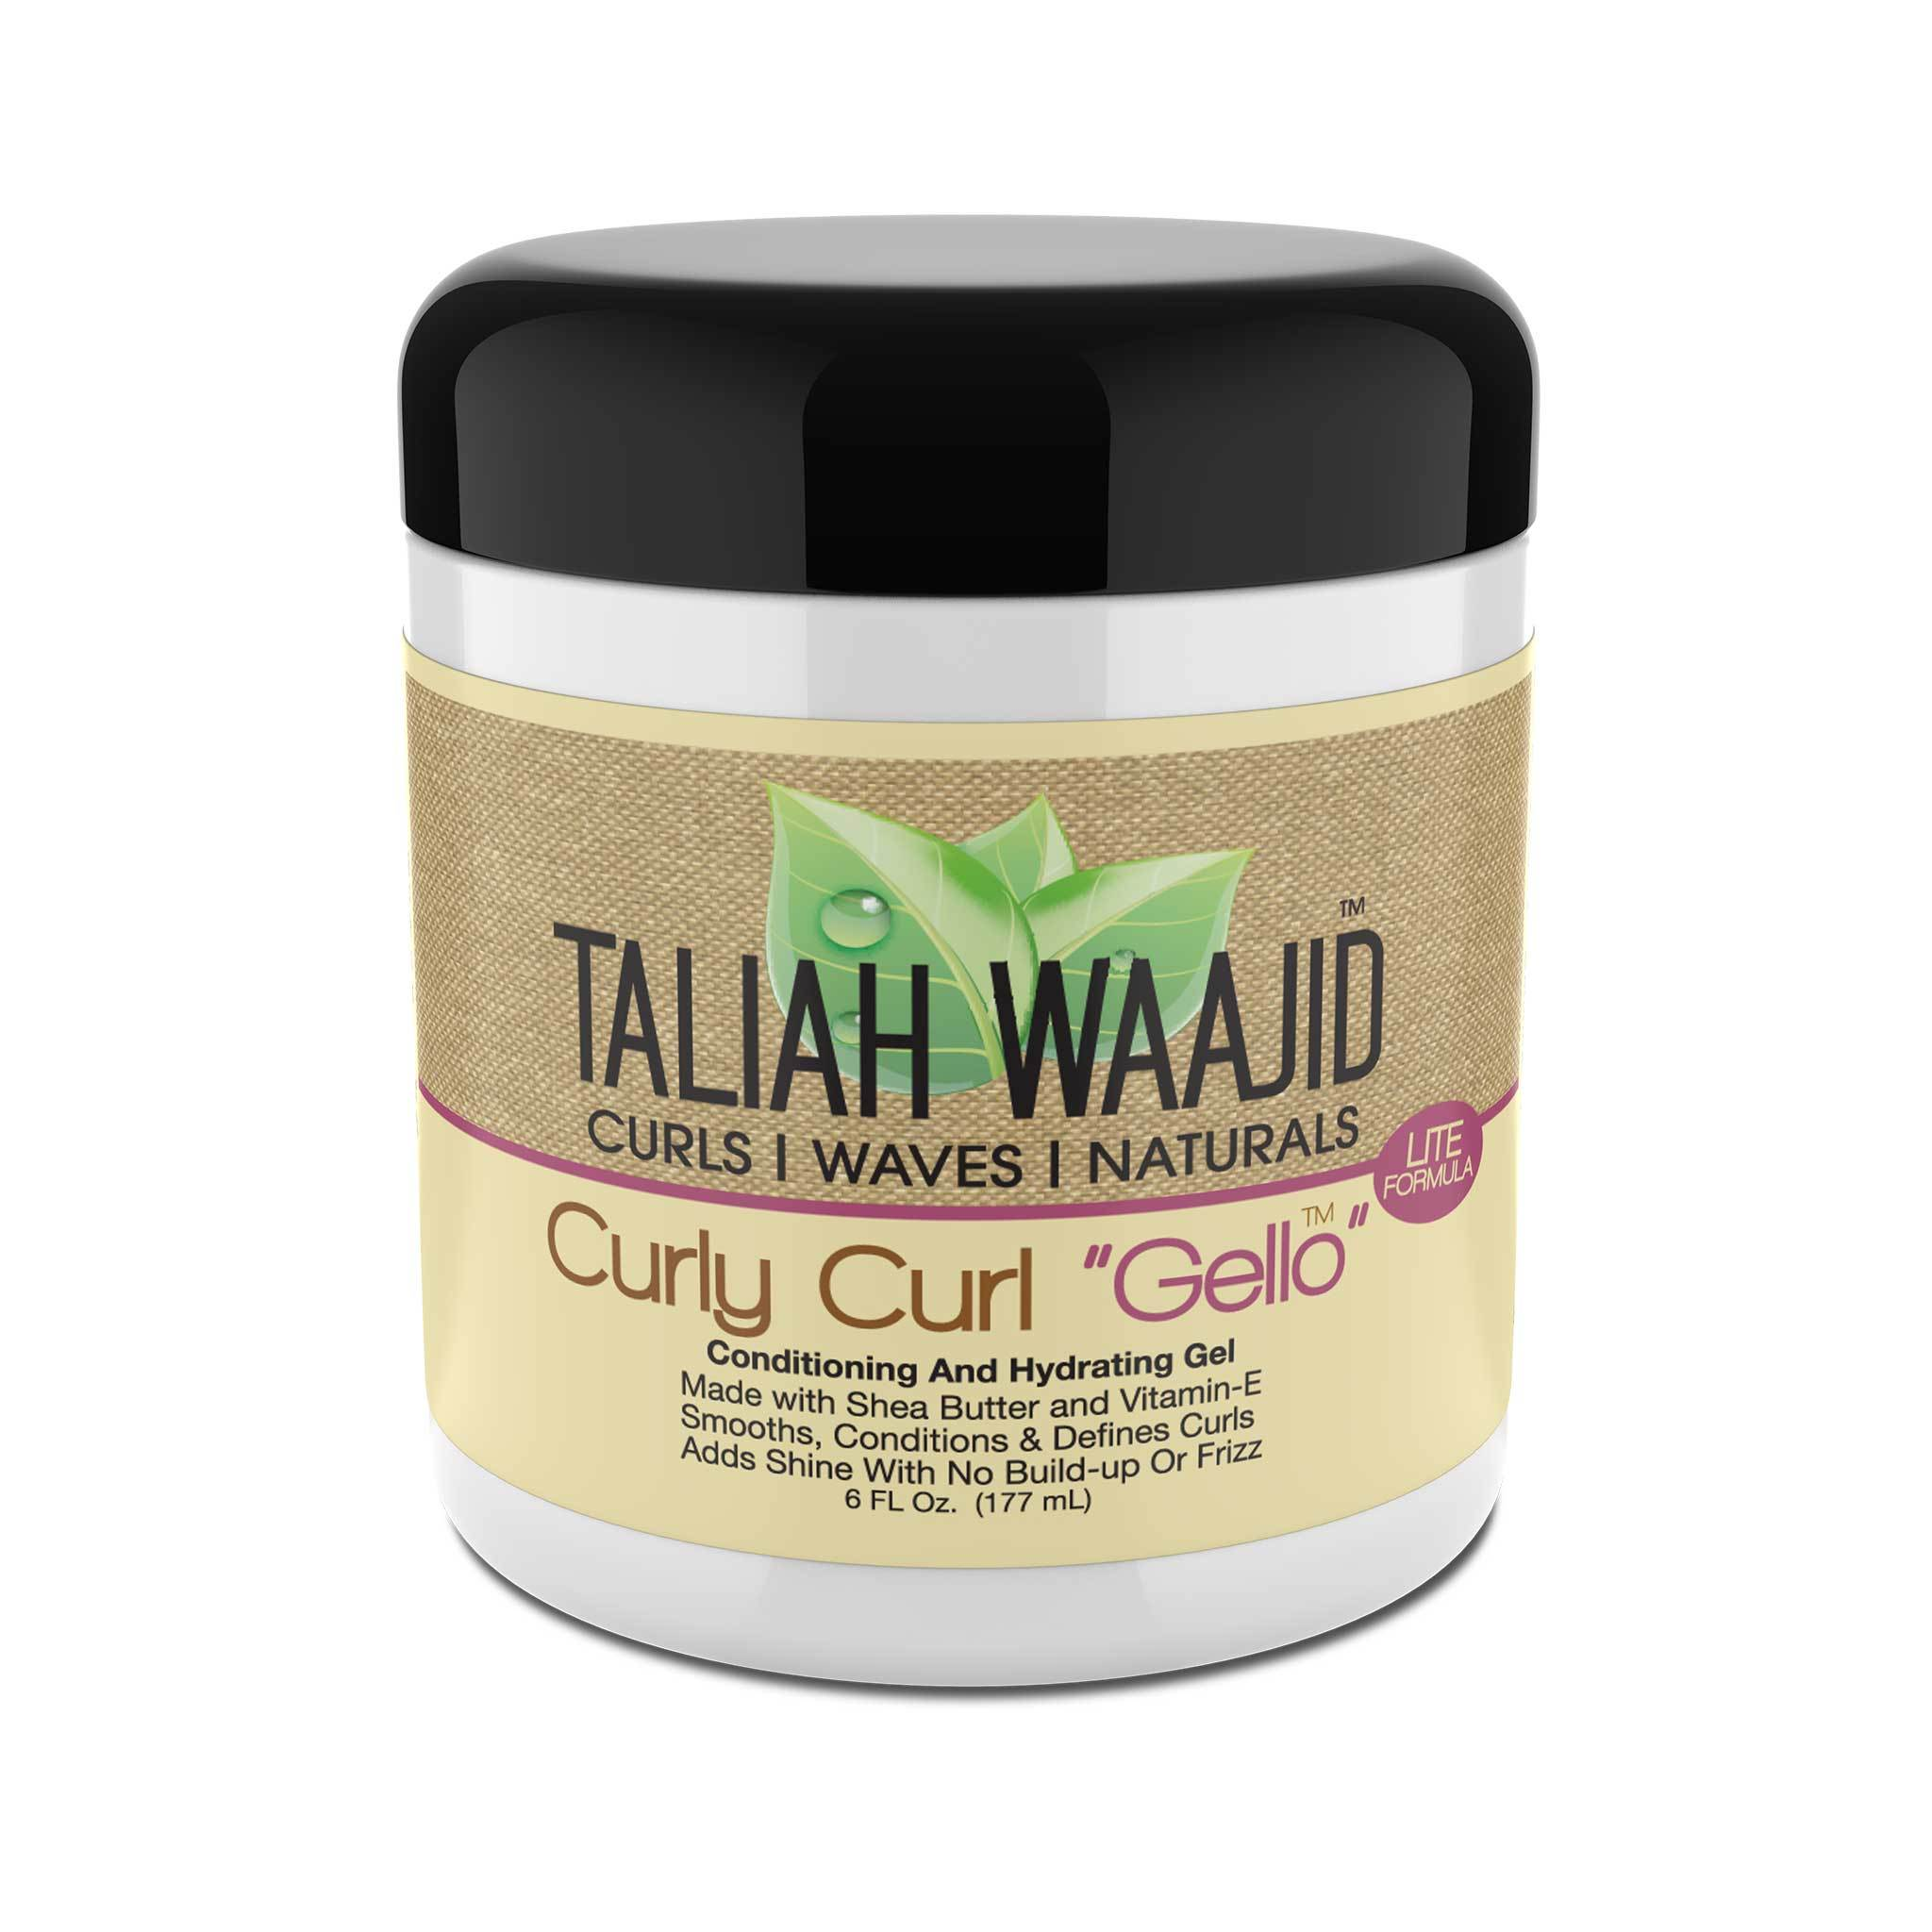 Taliah Waajid Curly Curl Gello Хидратиращ гел за къдрици 177 мл